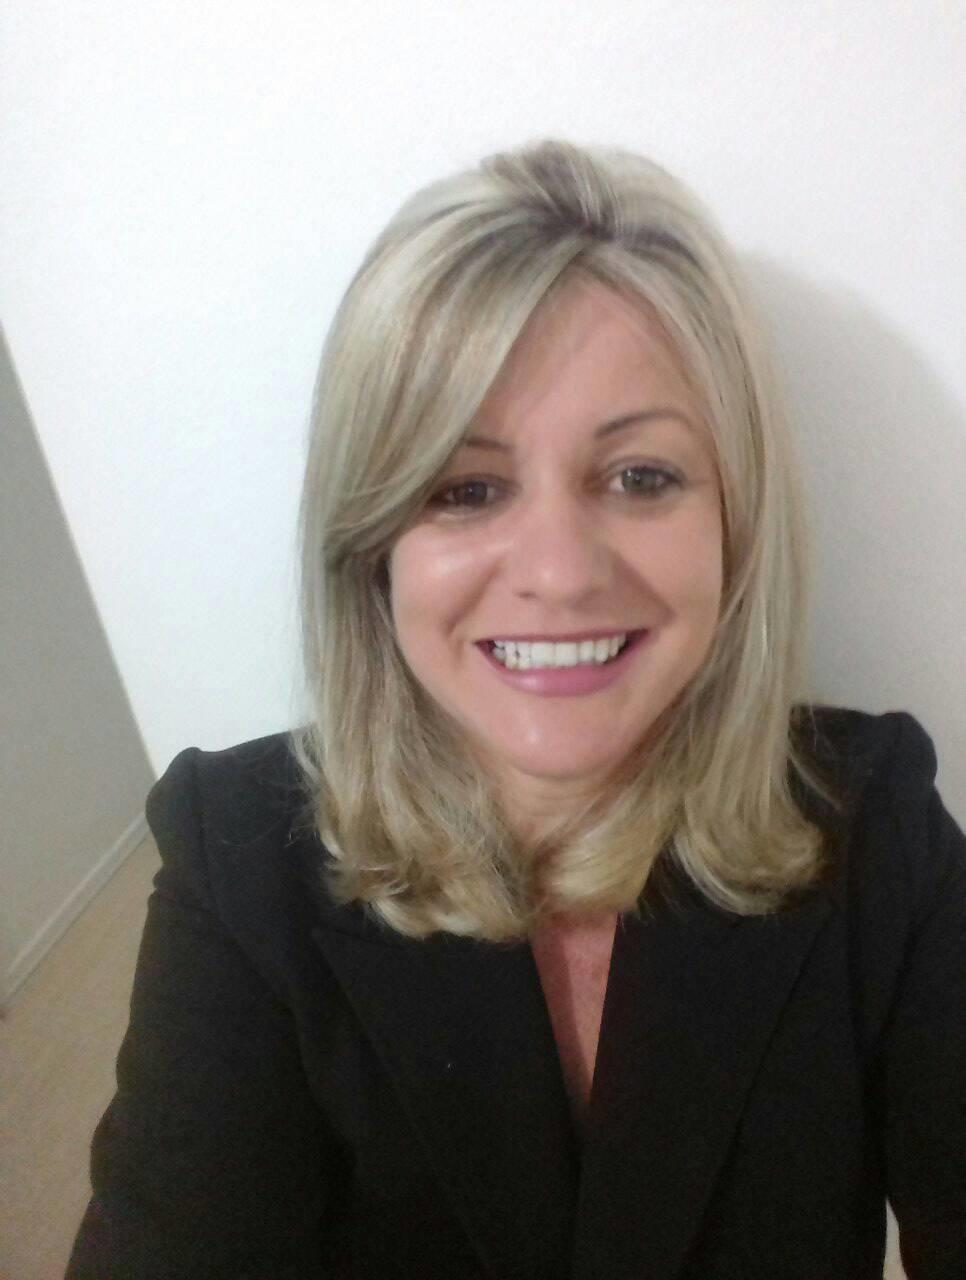 Aluno Renilda Ramos Ferreira